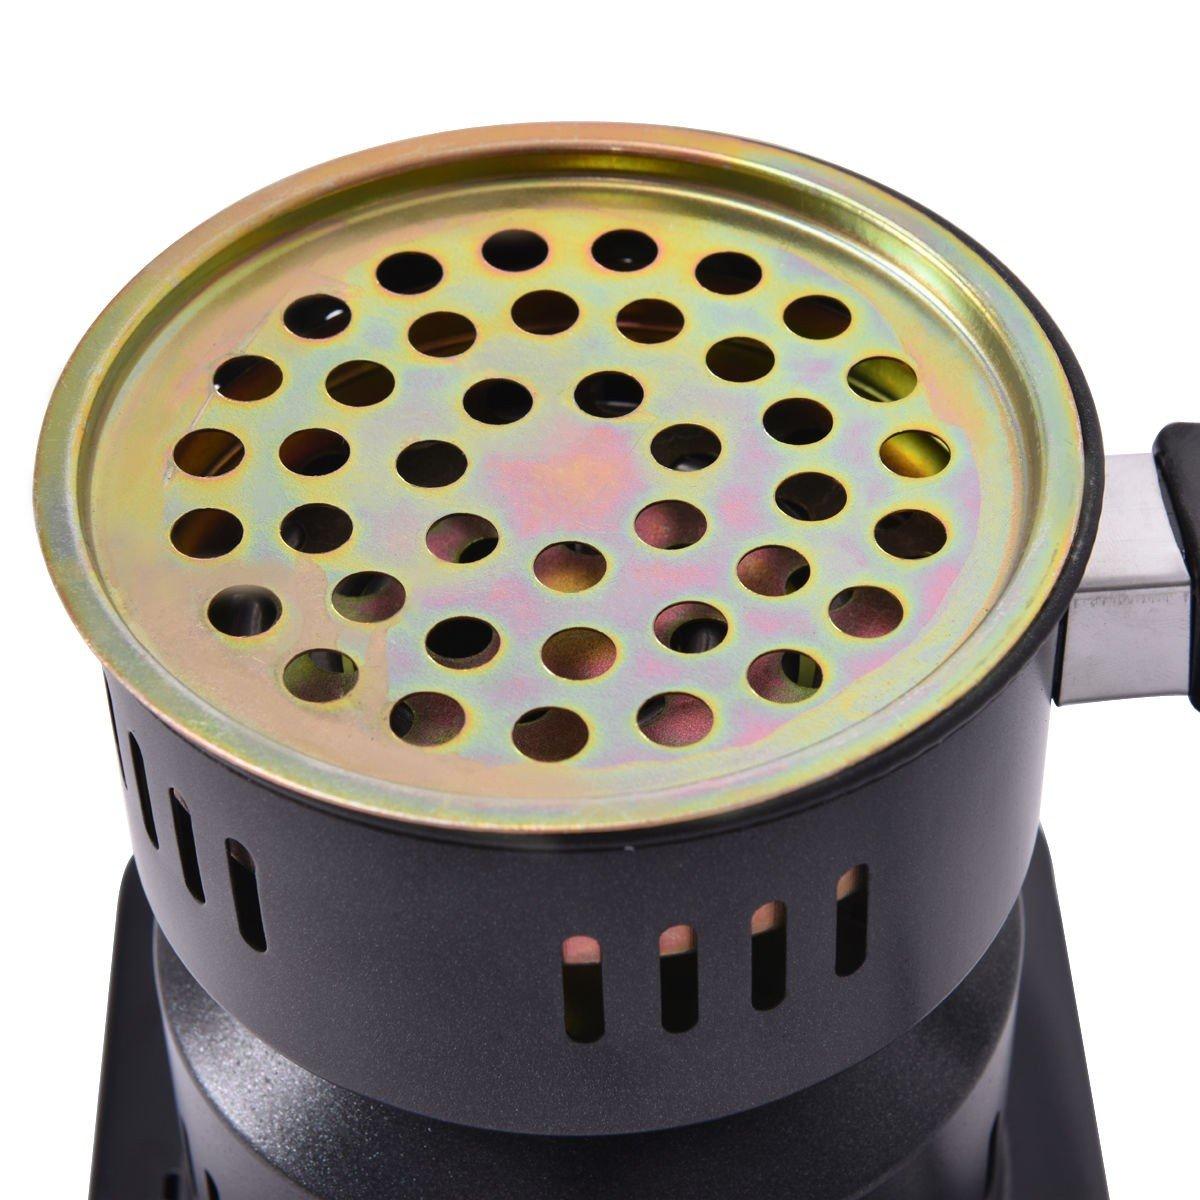 Electric Charcoal Starter Hookah Shisha Nargila Heater Stove Charcoal Burner Costway by COSTWAY (Image #3)